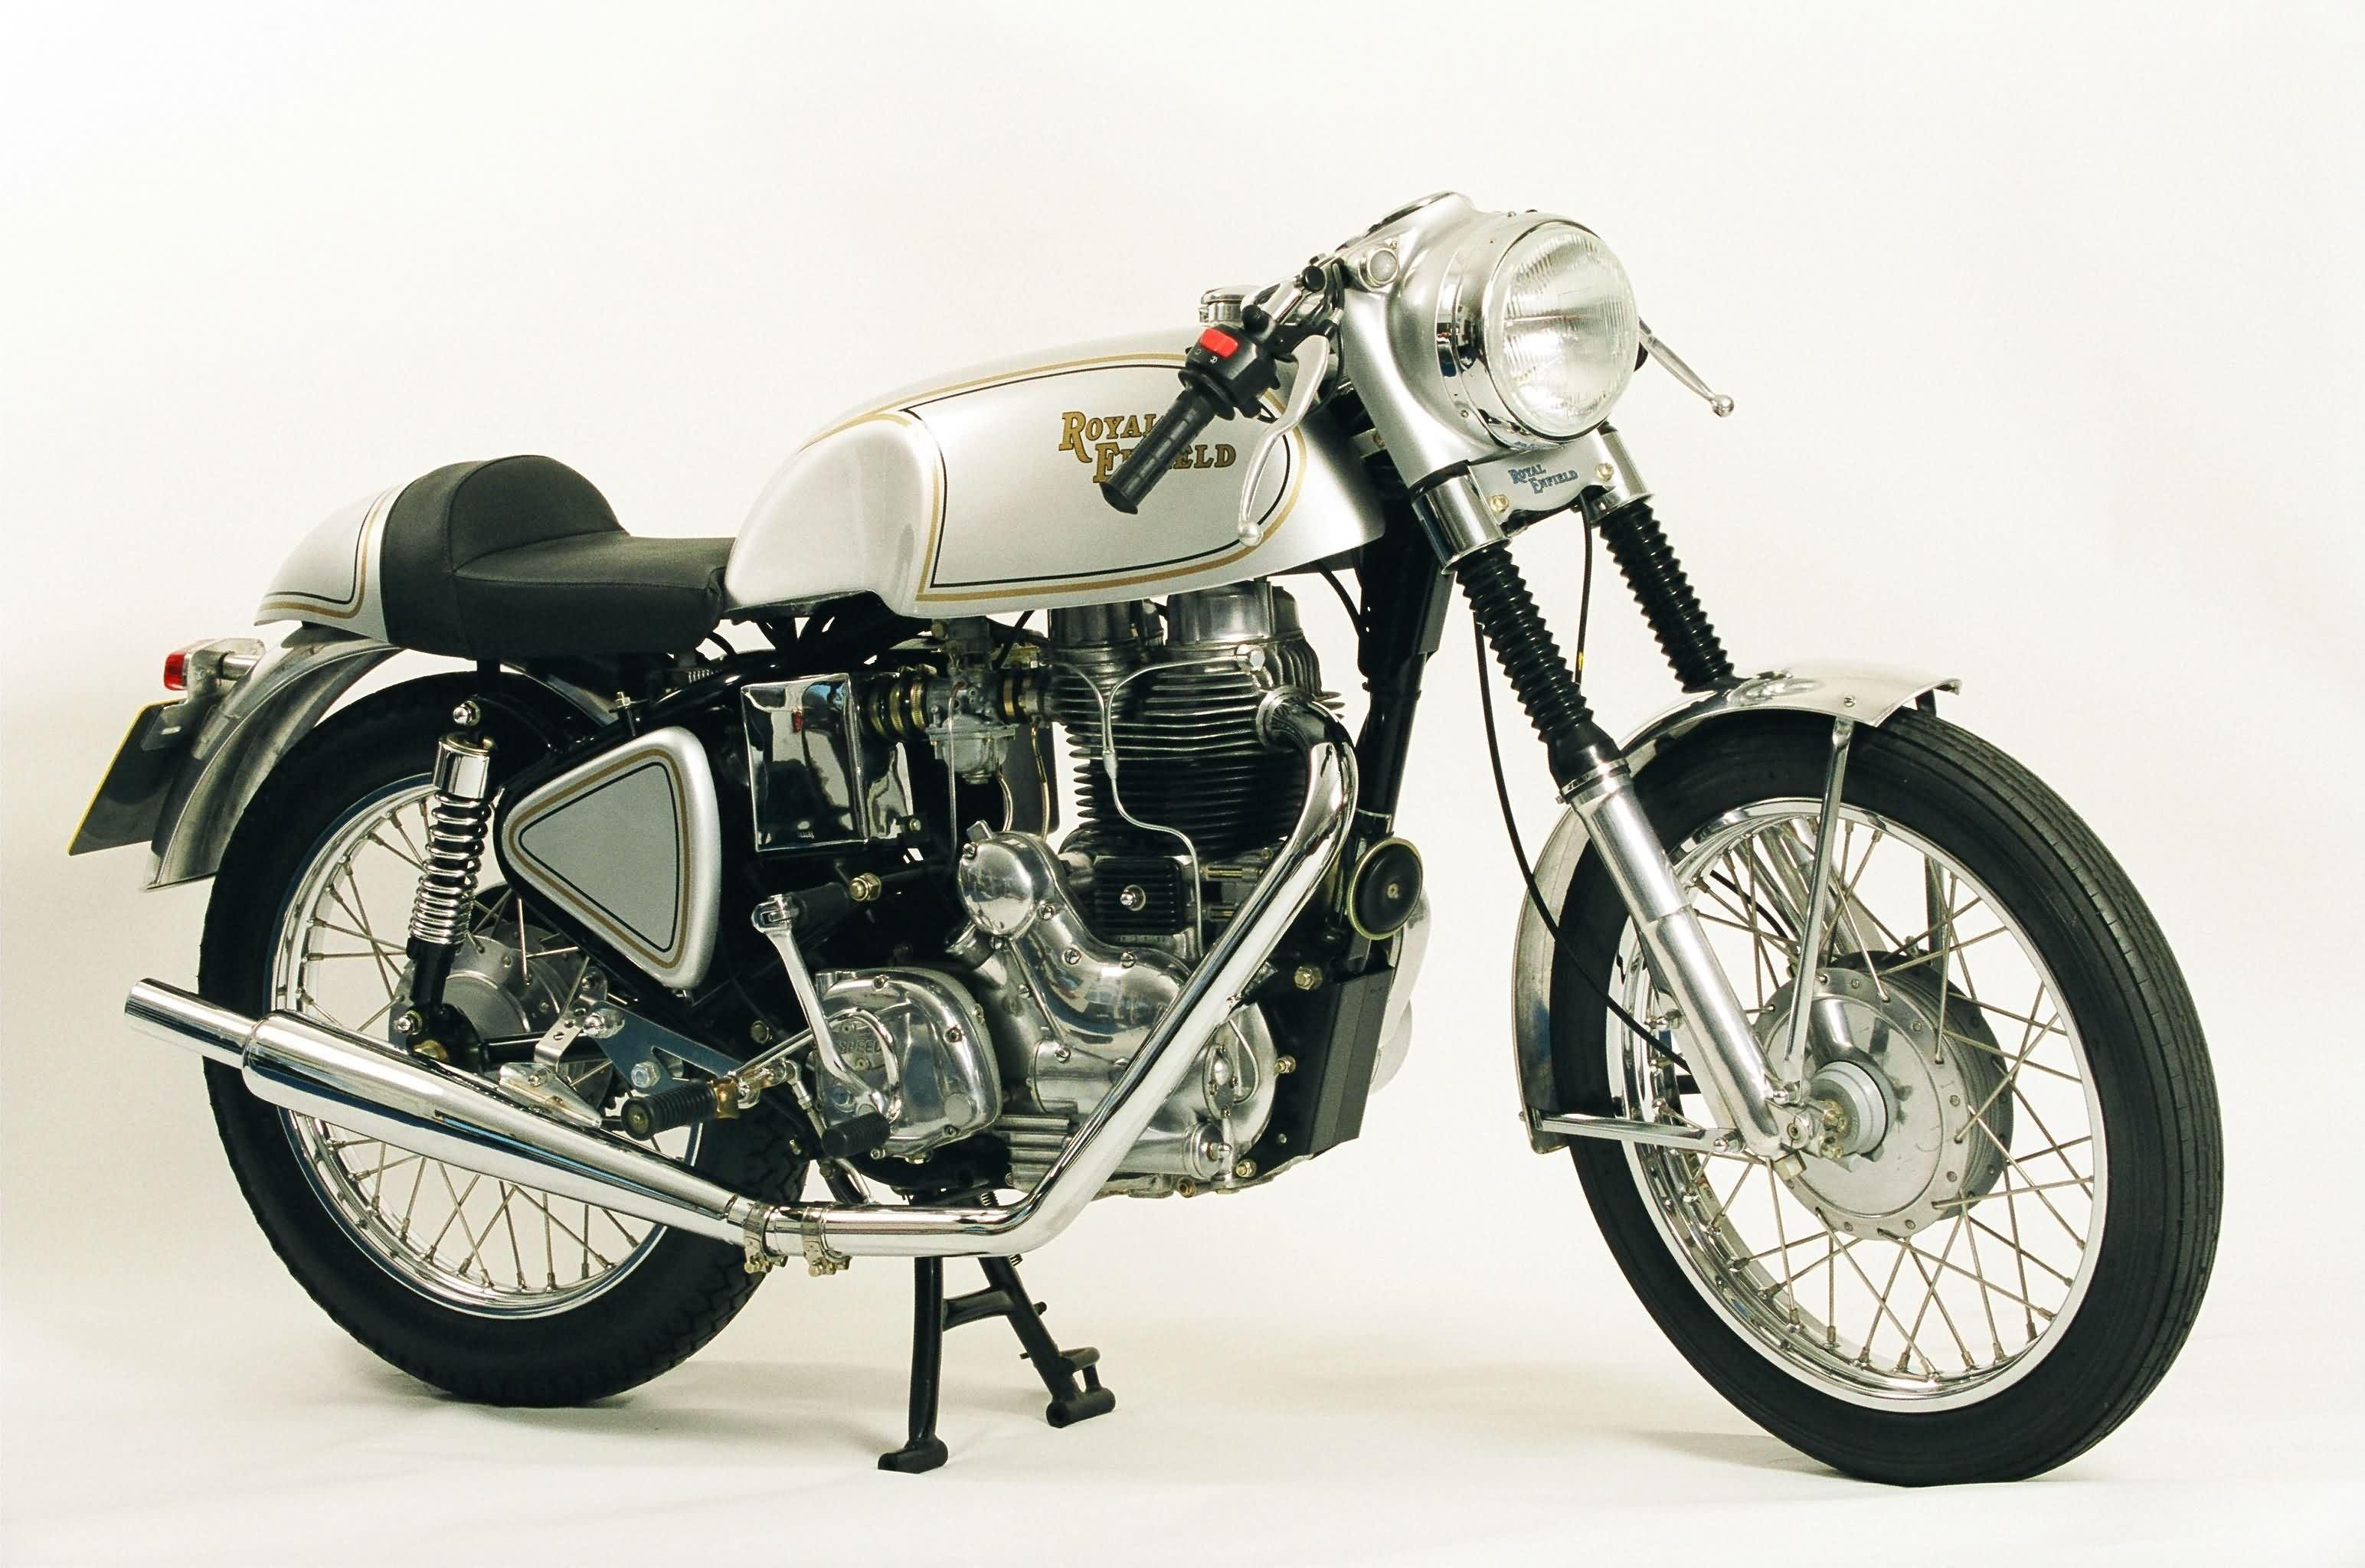 royal enfield classic moto neo retro 500cc 4h10. Black Bedroom Furniture Sets. Home Design Ideas